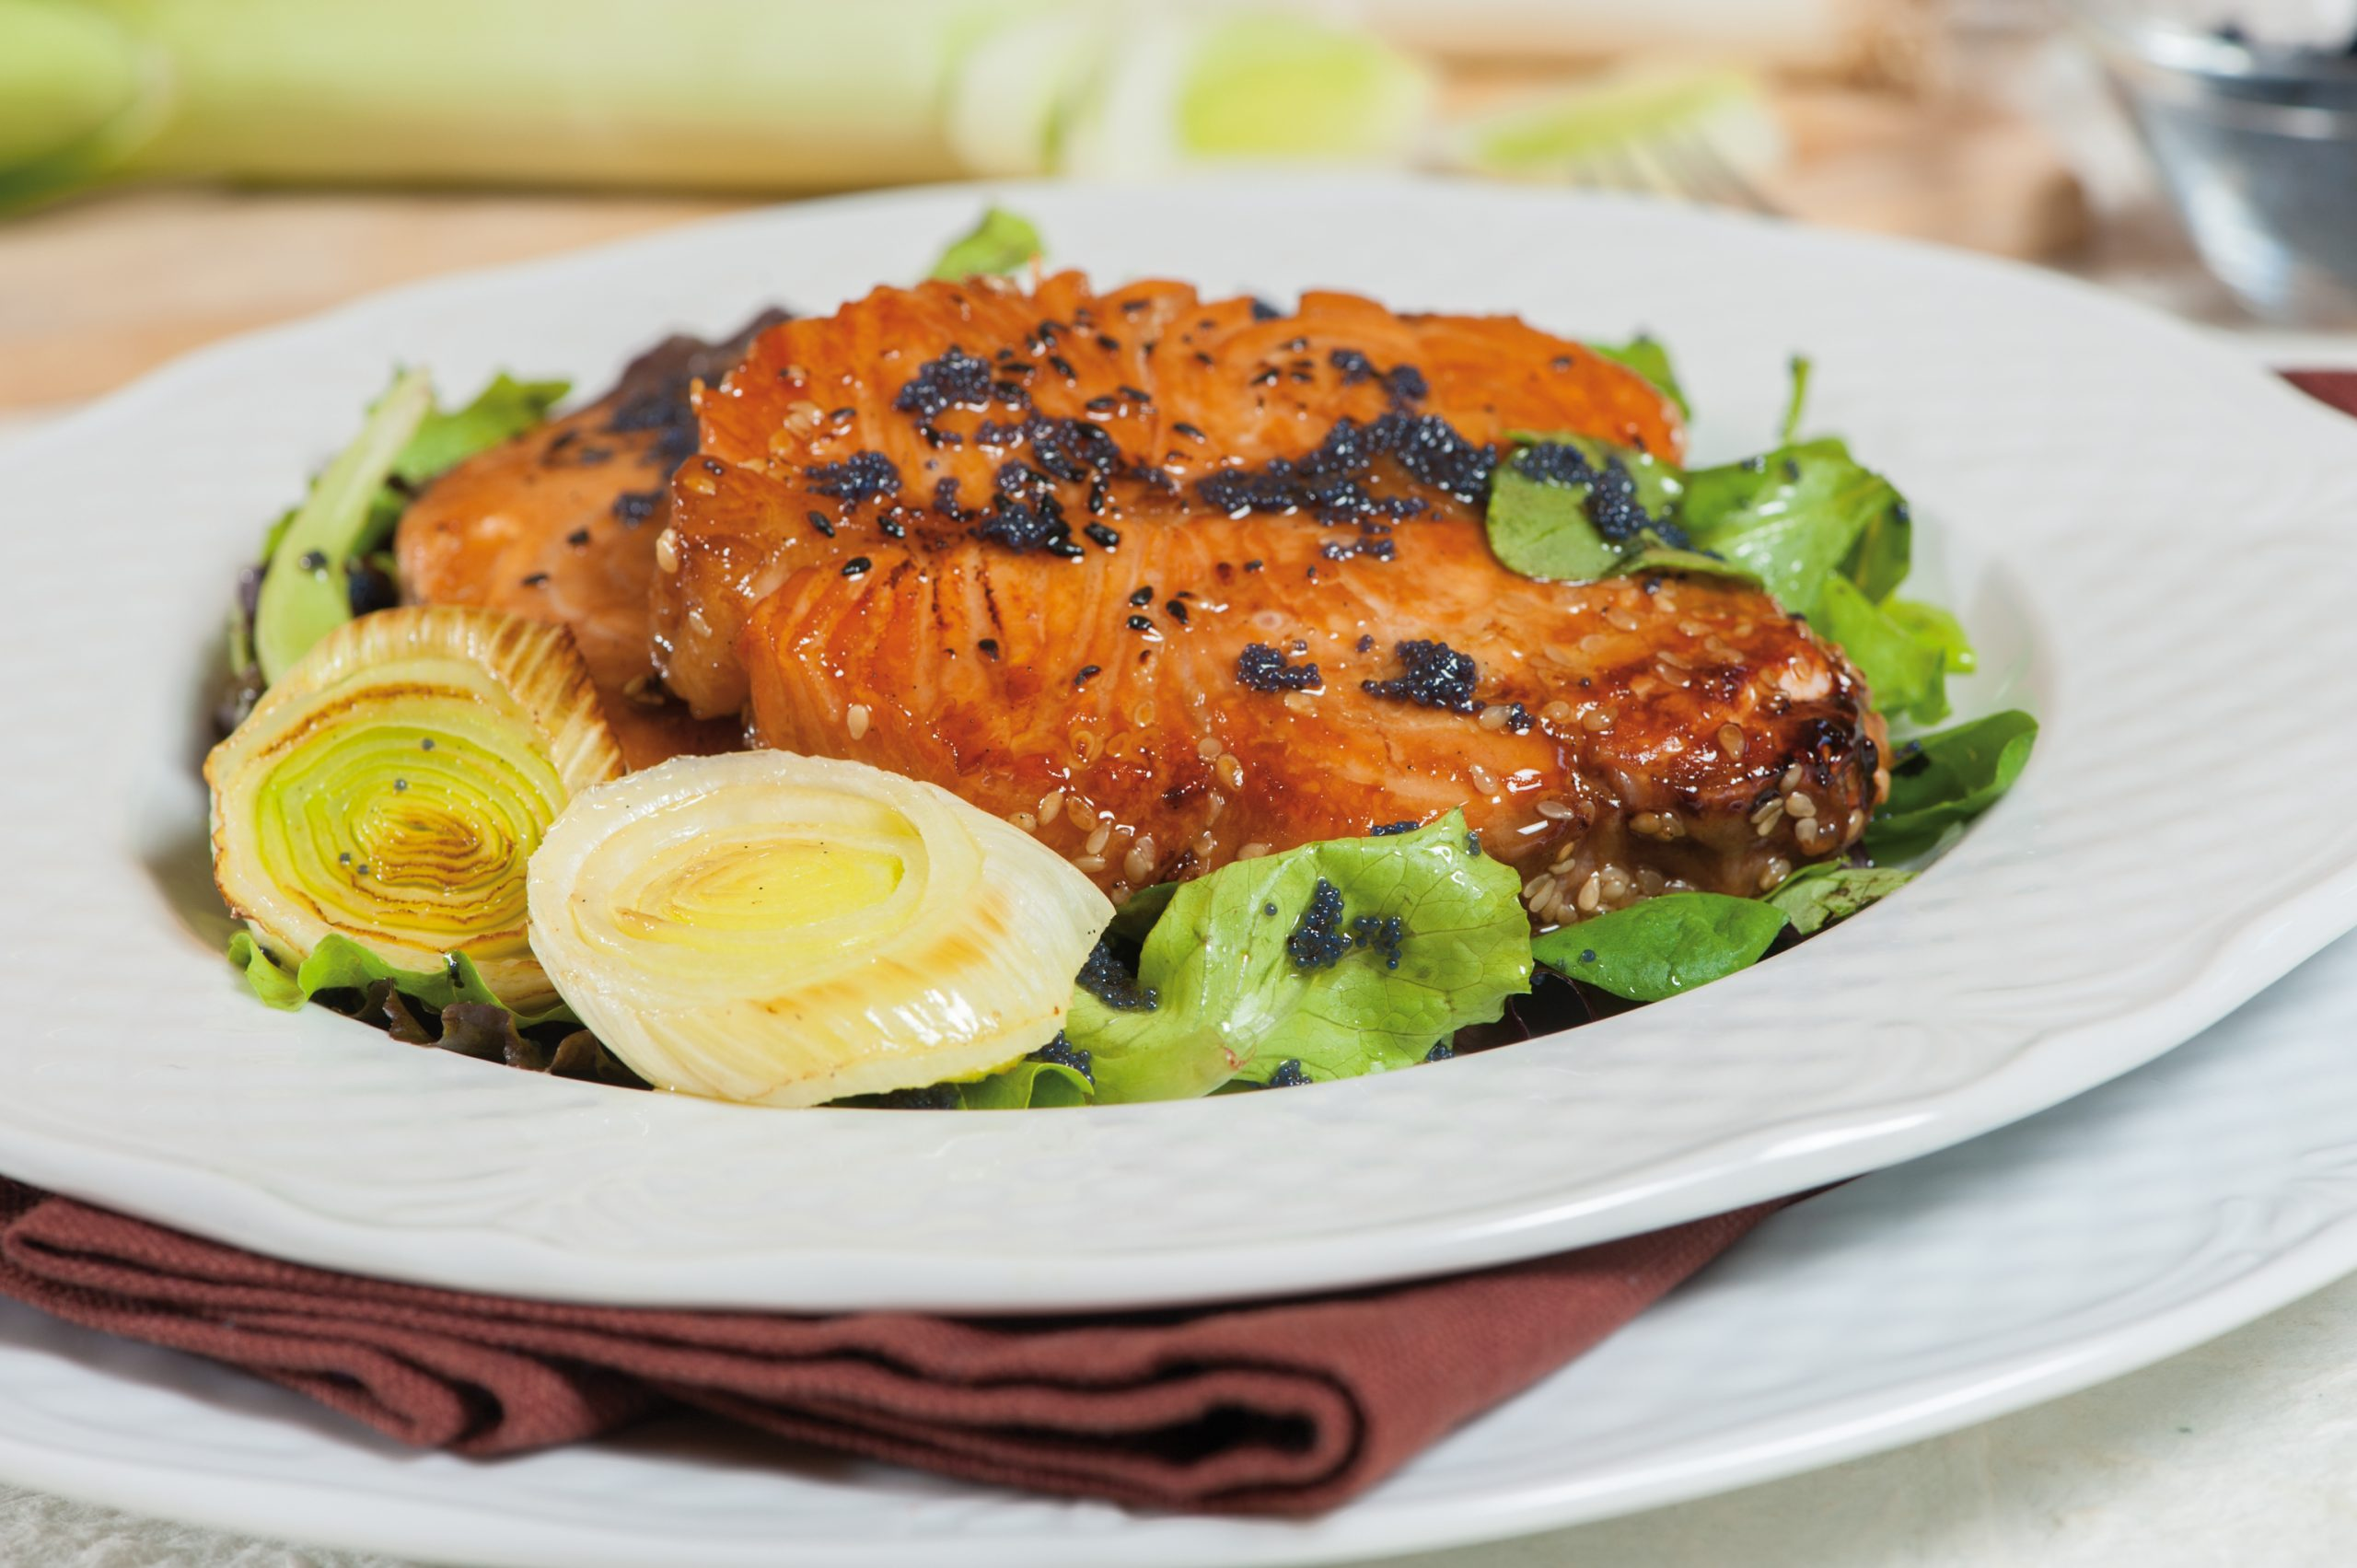 Ricetta Salmone Porri.Ricetta Salmone Con Porri Agrodolce